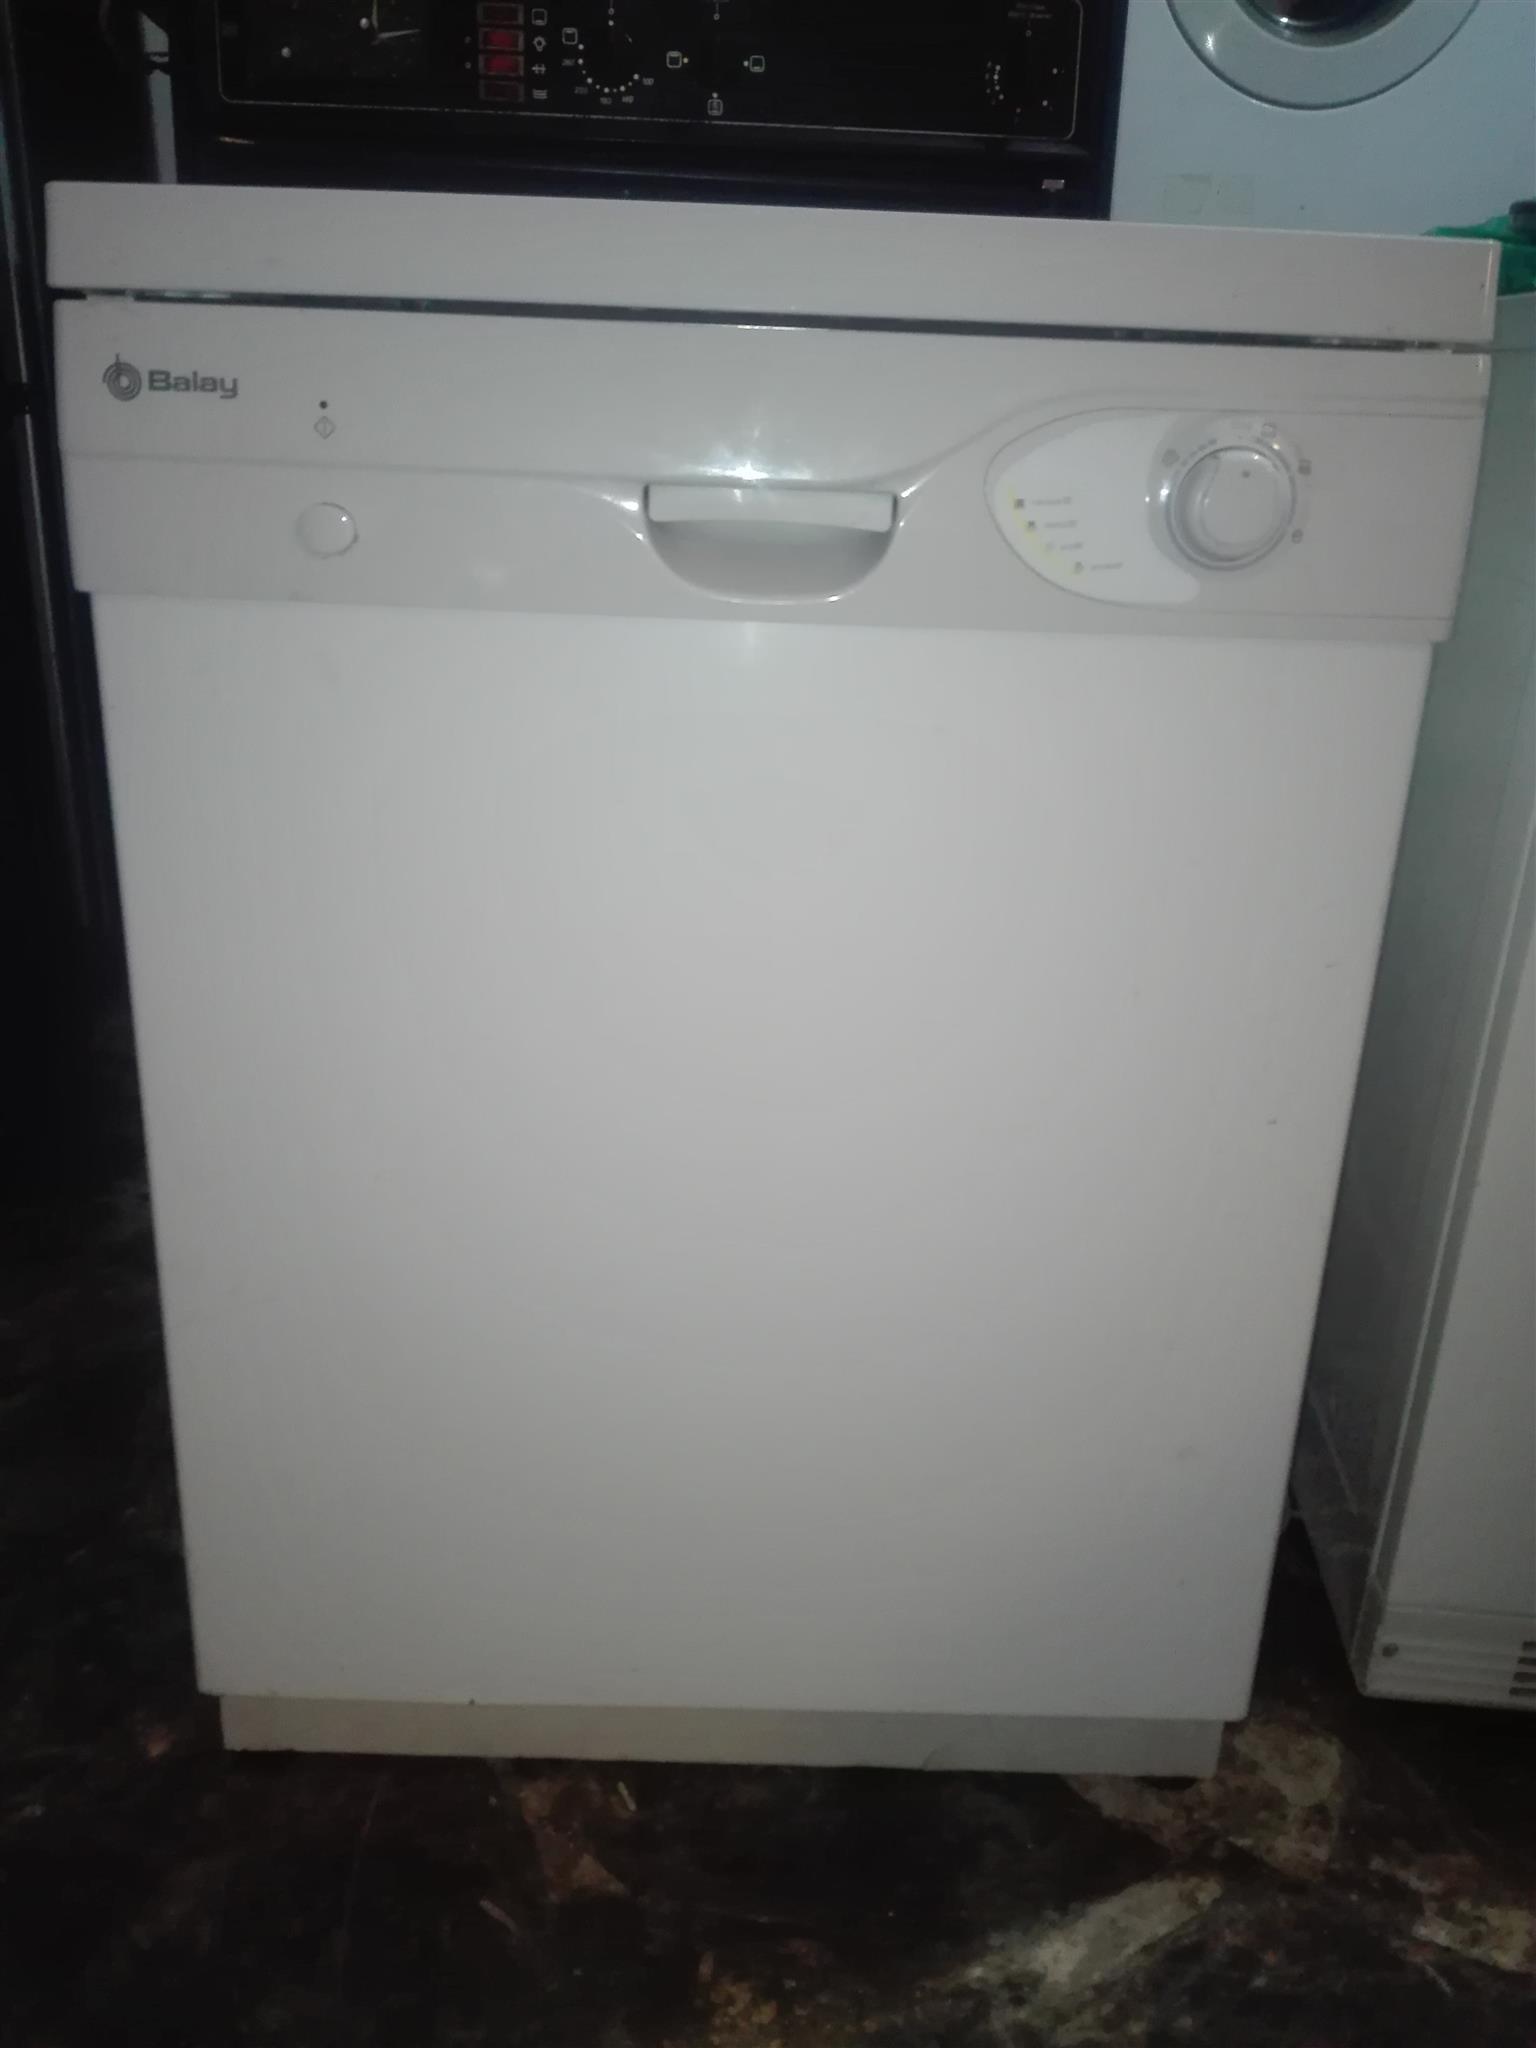 Balay dishwasher